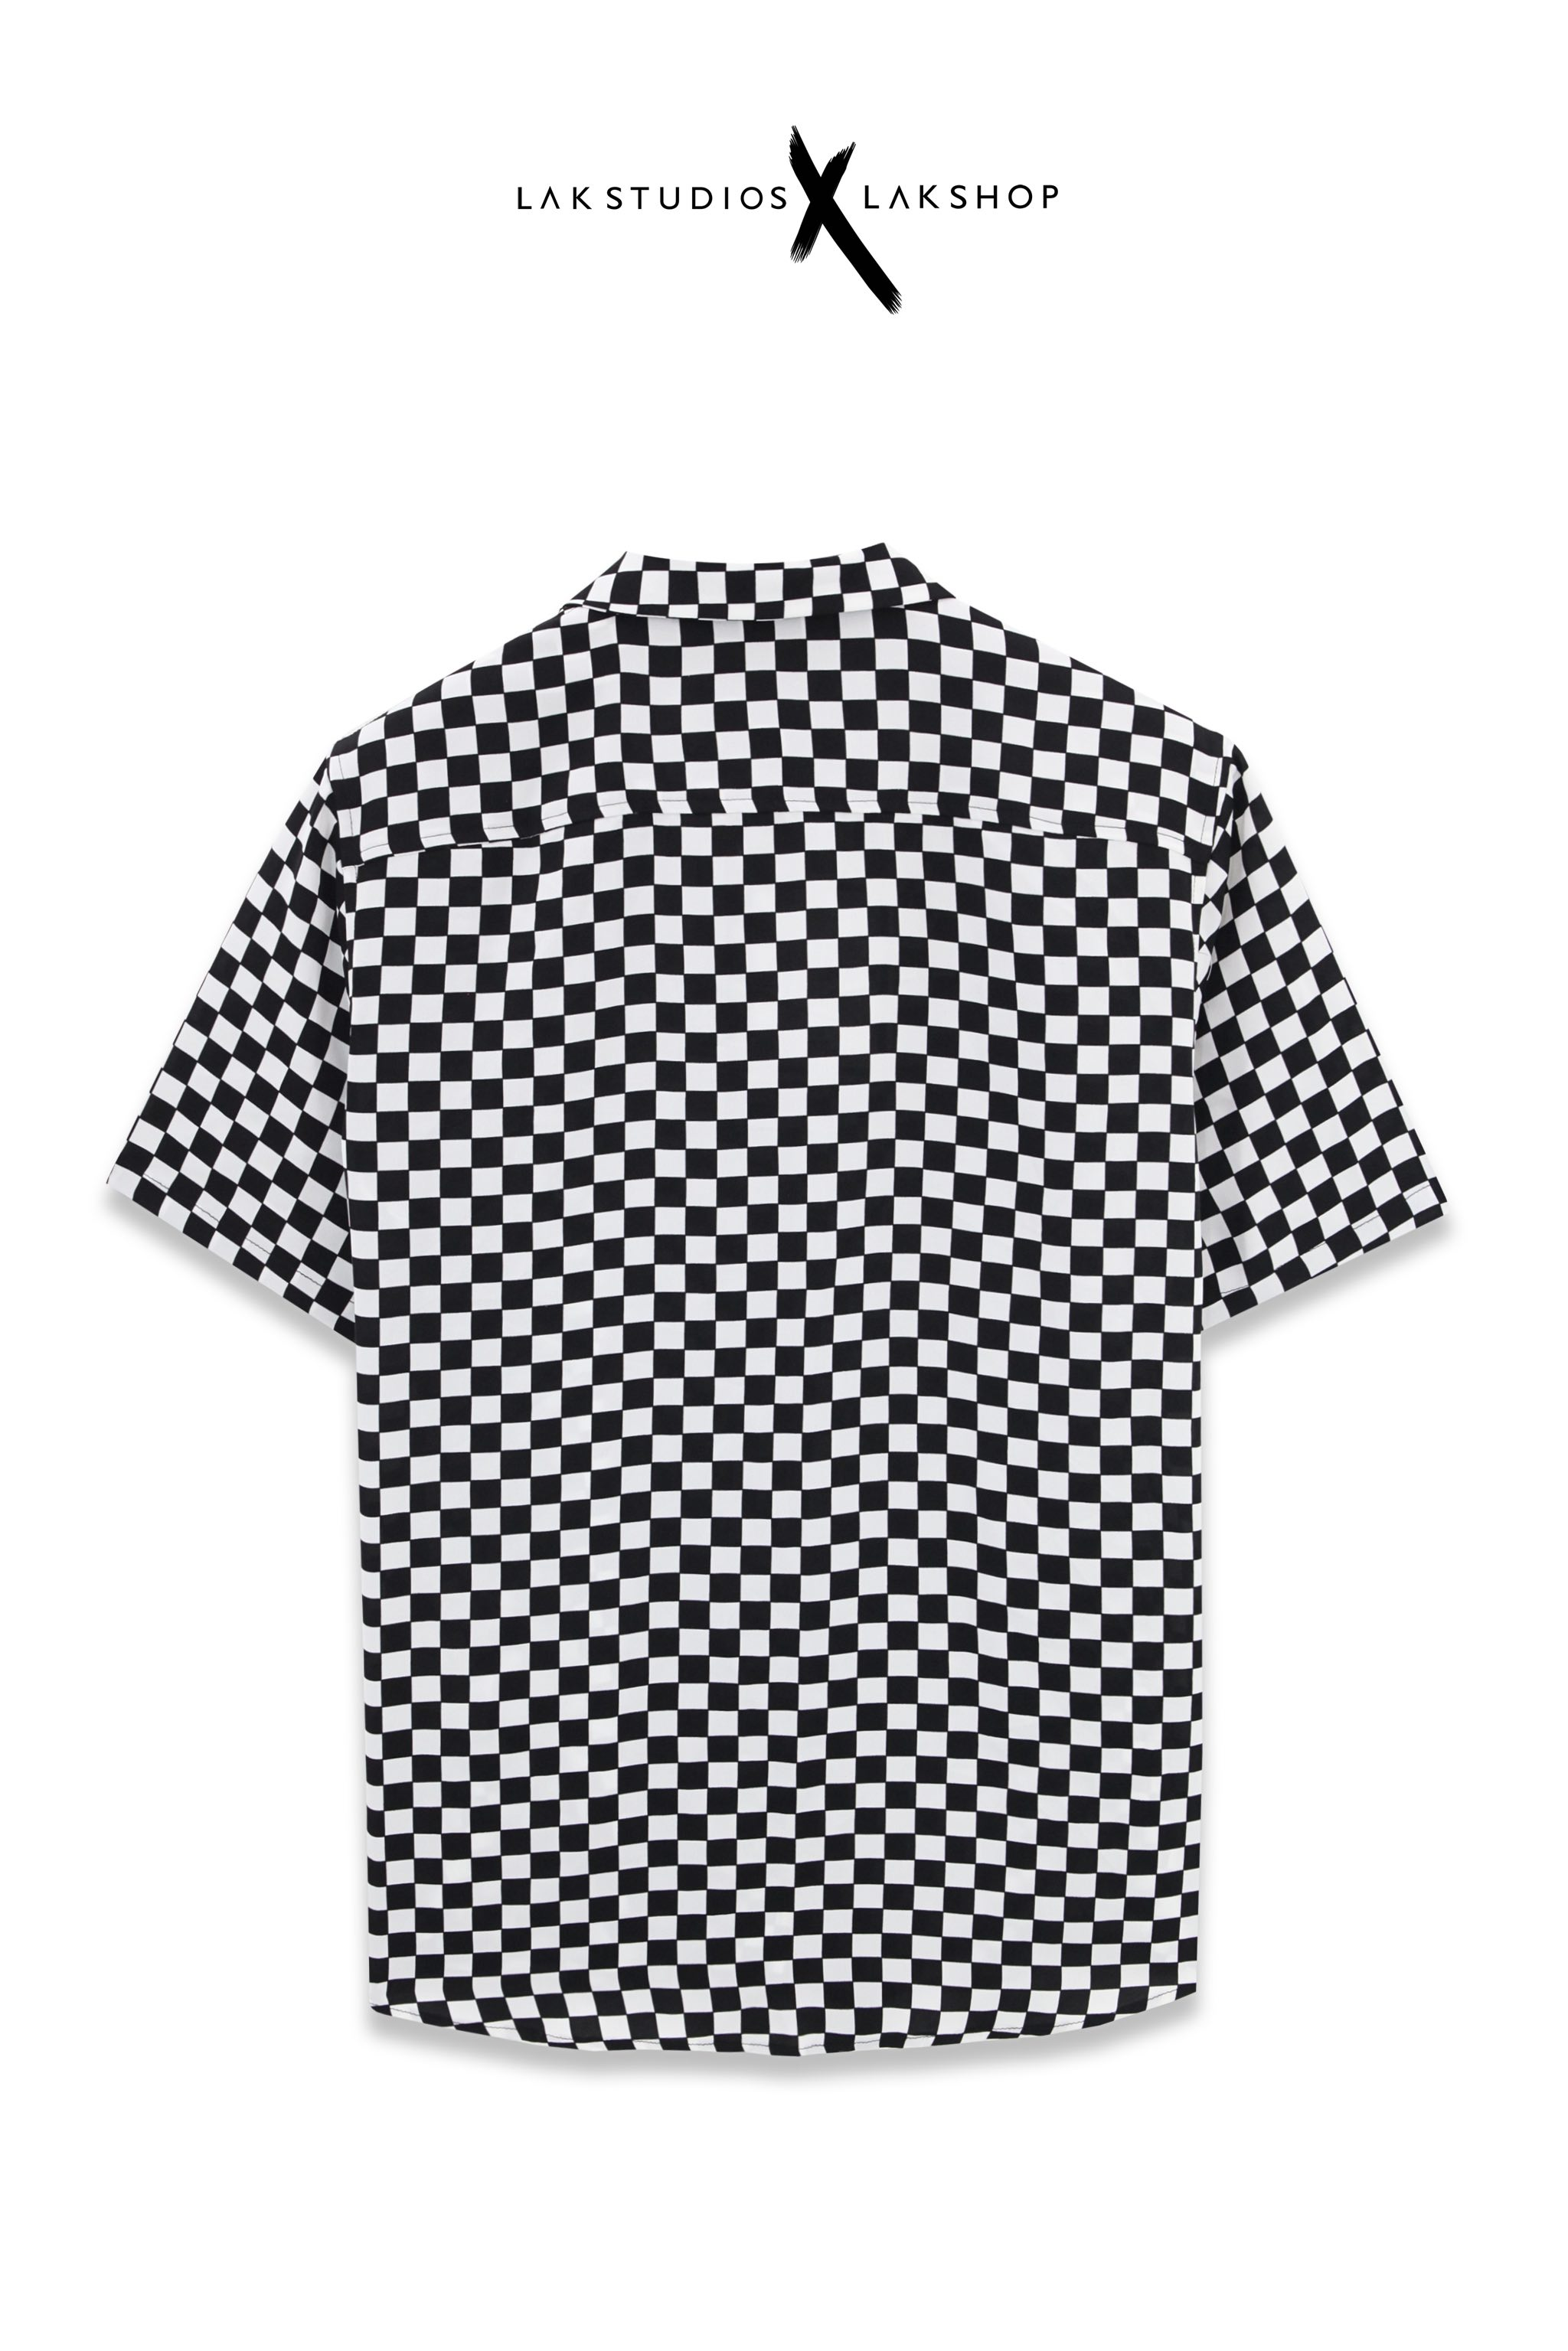 Lak Studios Grey Smoke Tweed Short Sleeve Shirt